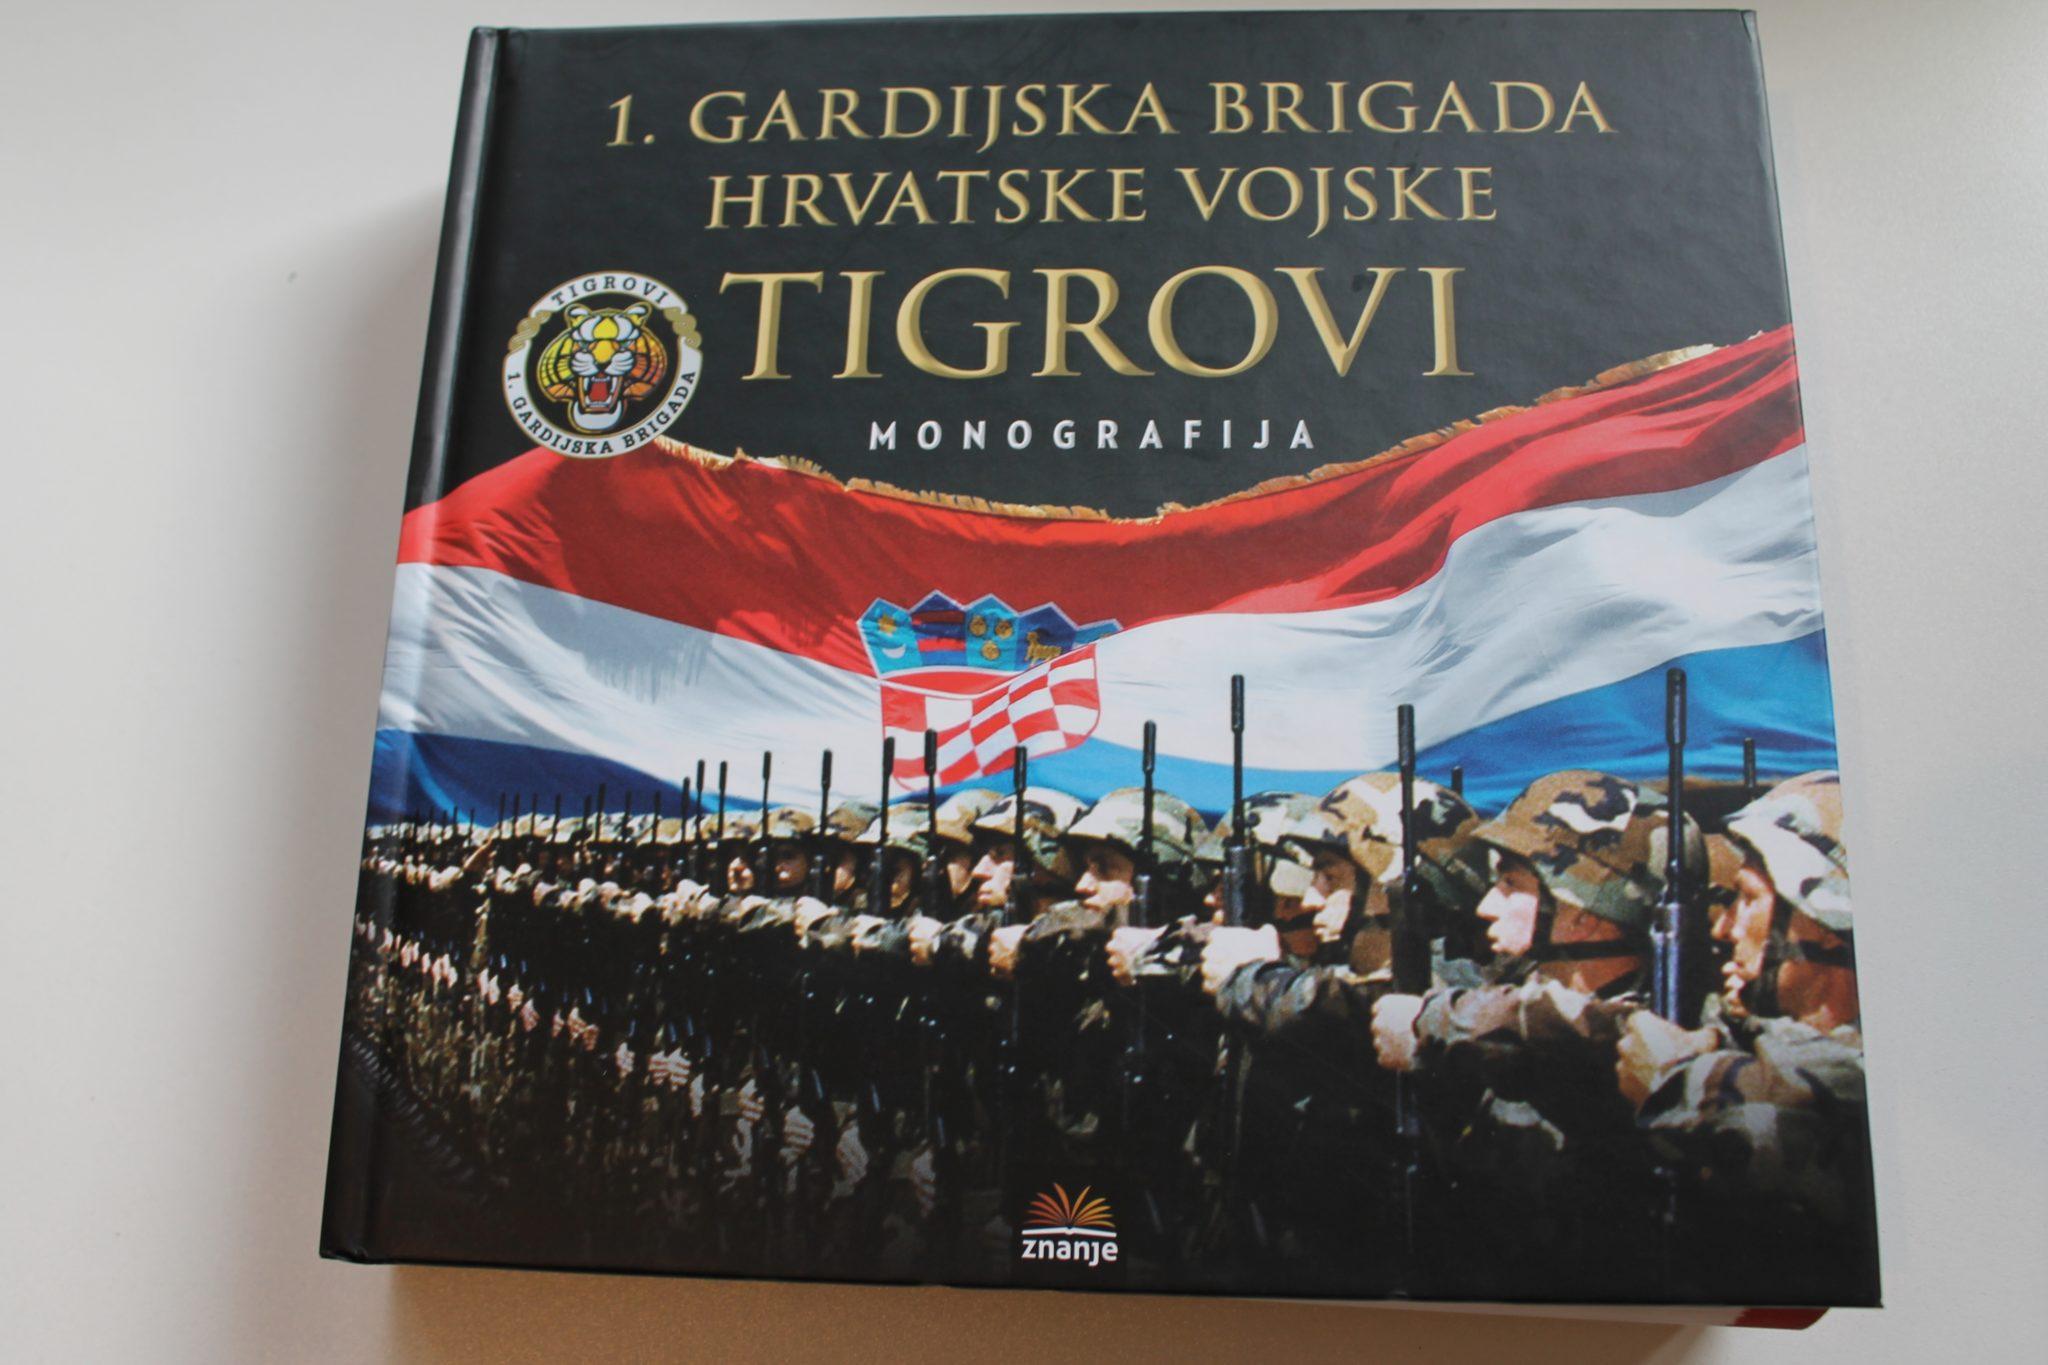 1.Gardijska brigada hrvatske vojske - Tigrovi